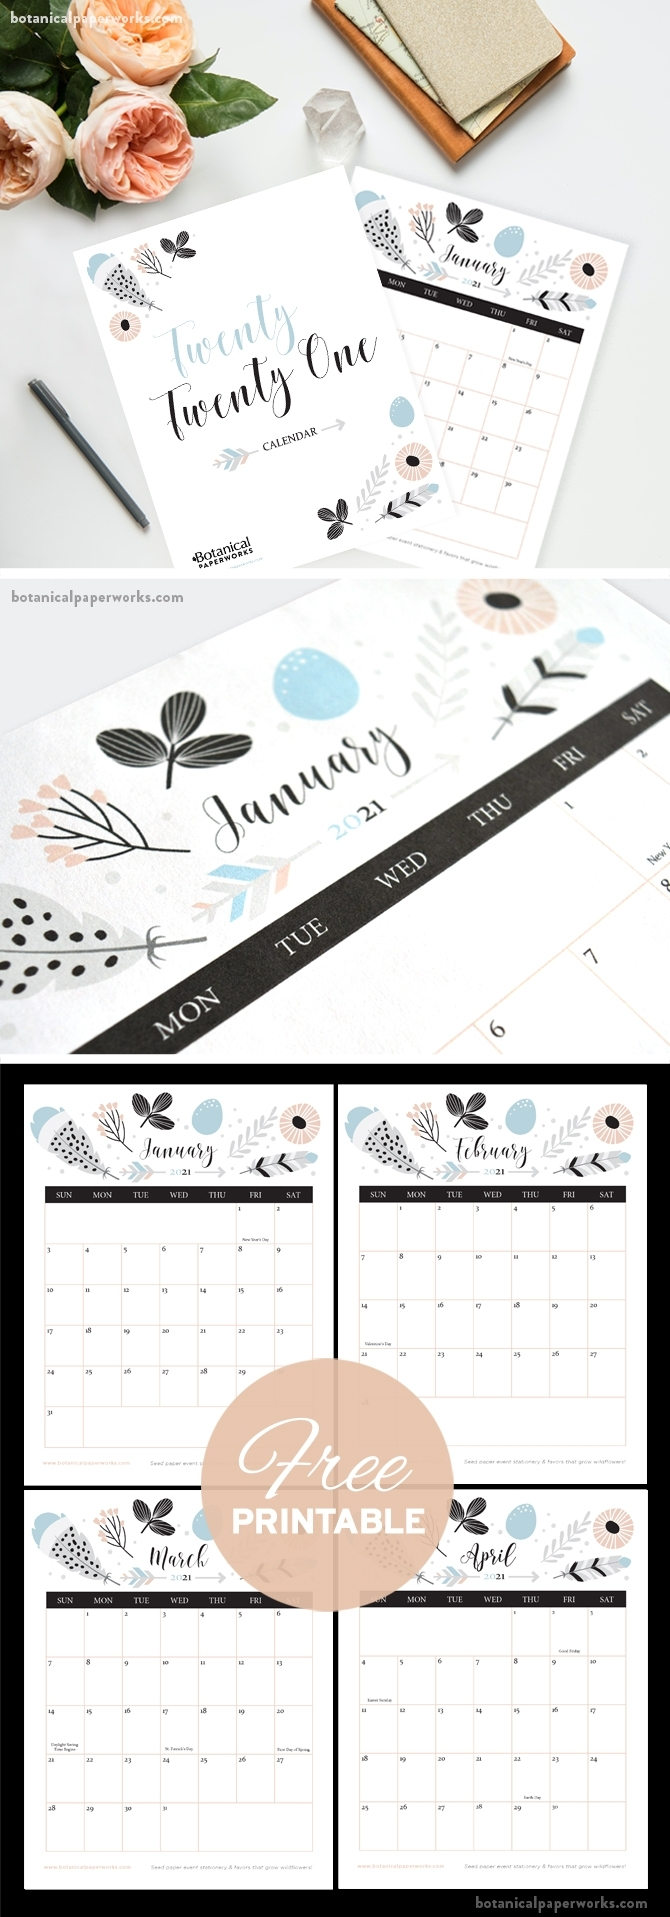 Collect 2021 September Calendar Hello Kitty Inspired